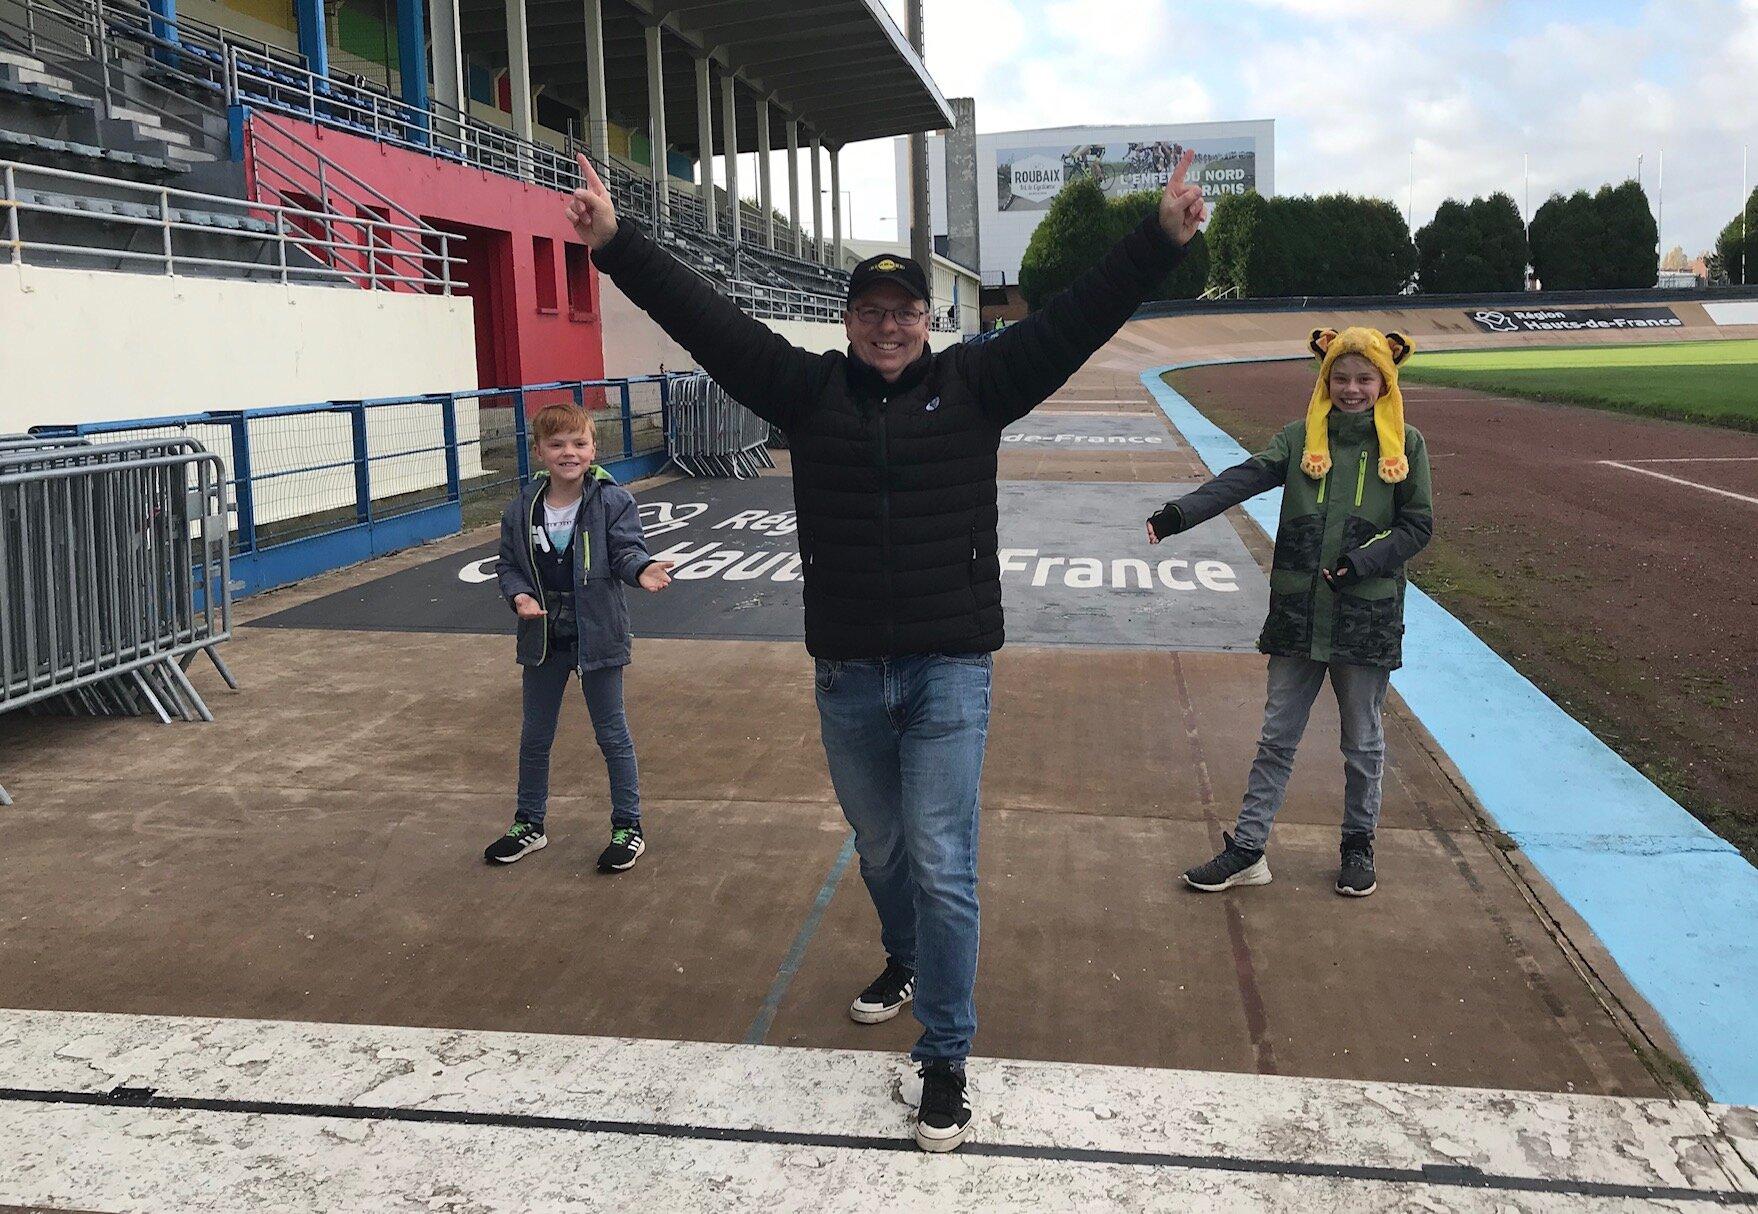 Roubaix Velodrome @ 12 Nov - Davide Browne (BiciSport Master) takes the victory salute at the Roubaix Velodrome